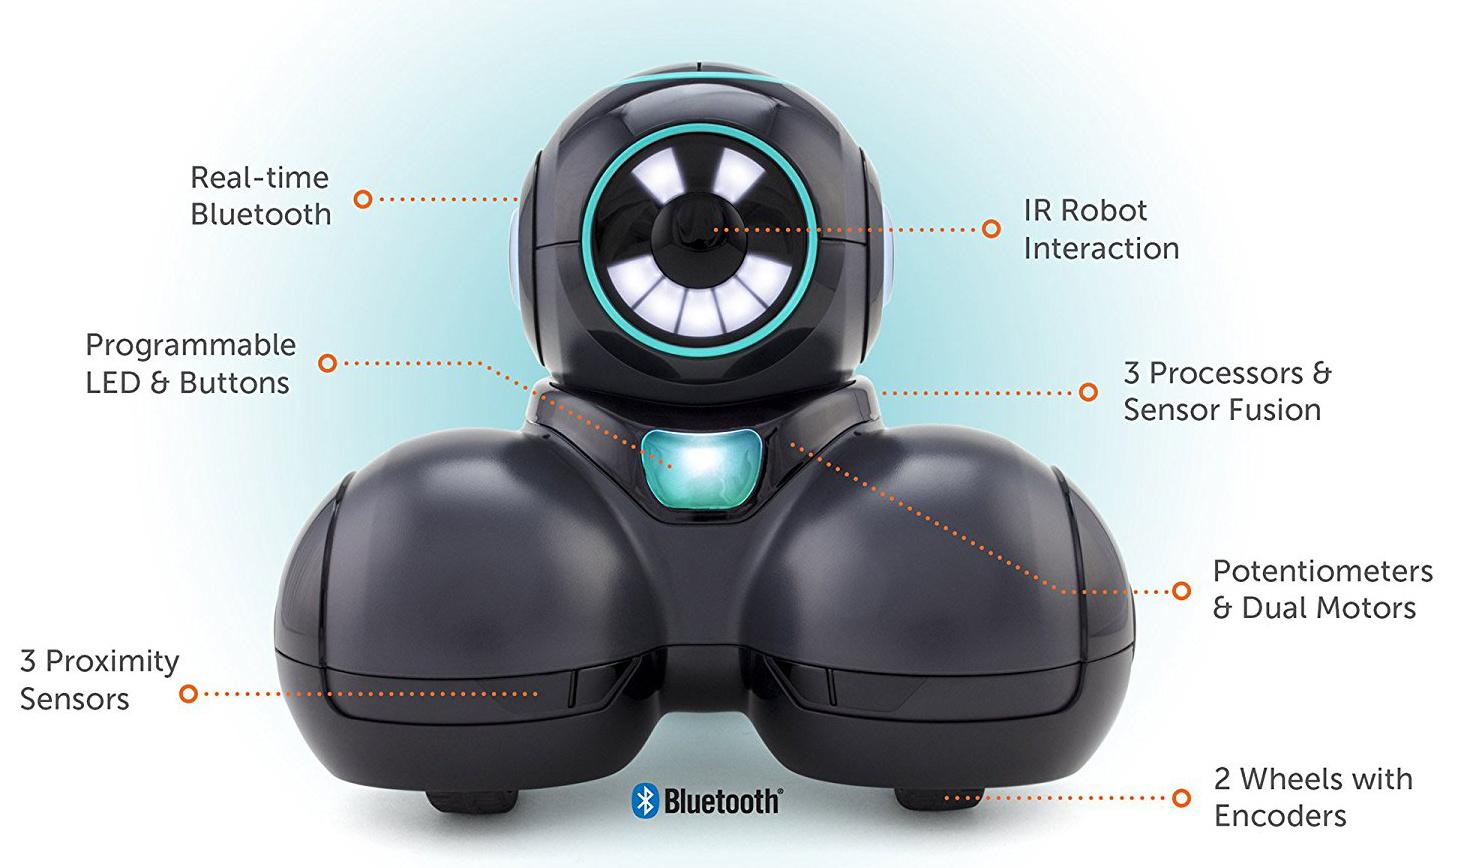 The Cue For Teaching Kids Robotics